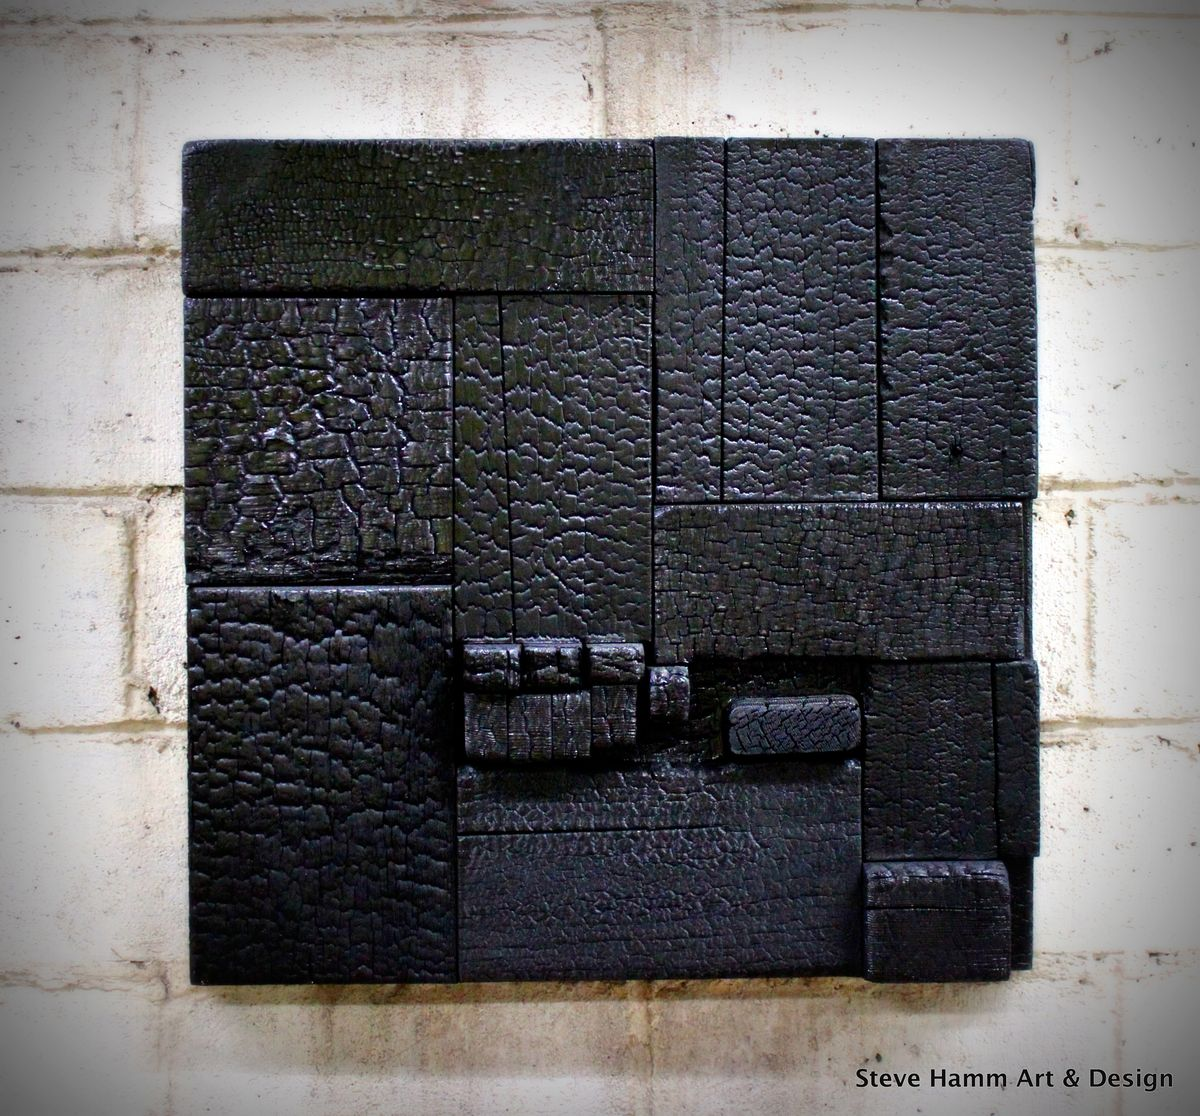 1000 images about shou sugi ban on pinterest charred wood burnt wood and exterior siding. Black Bedroom Furniture Sets. Home Design Ideas